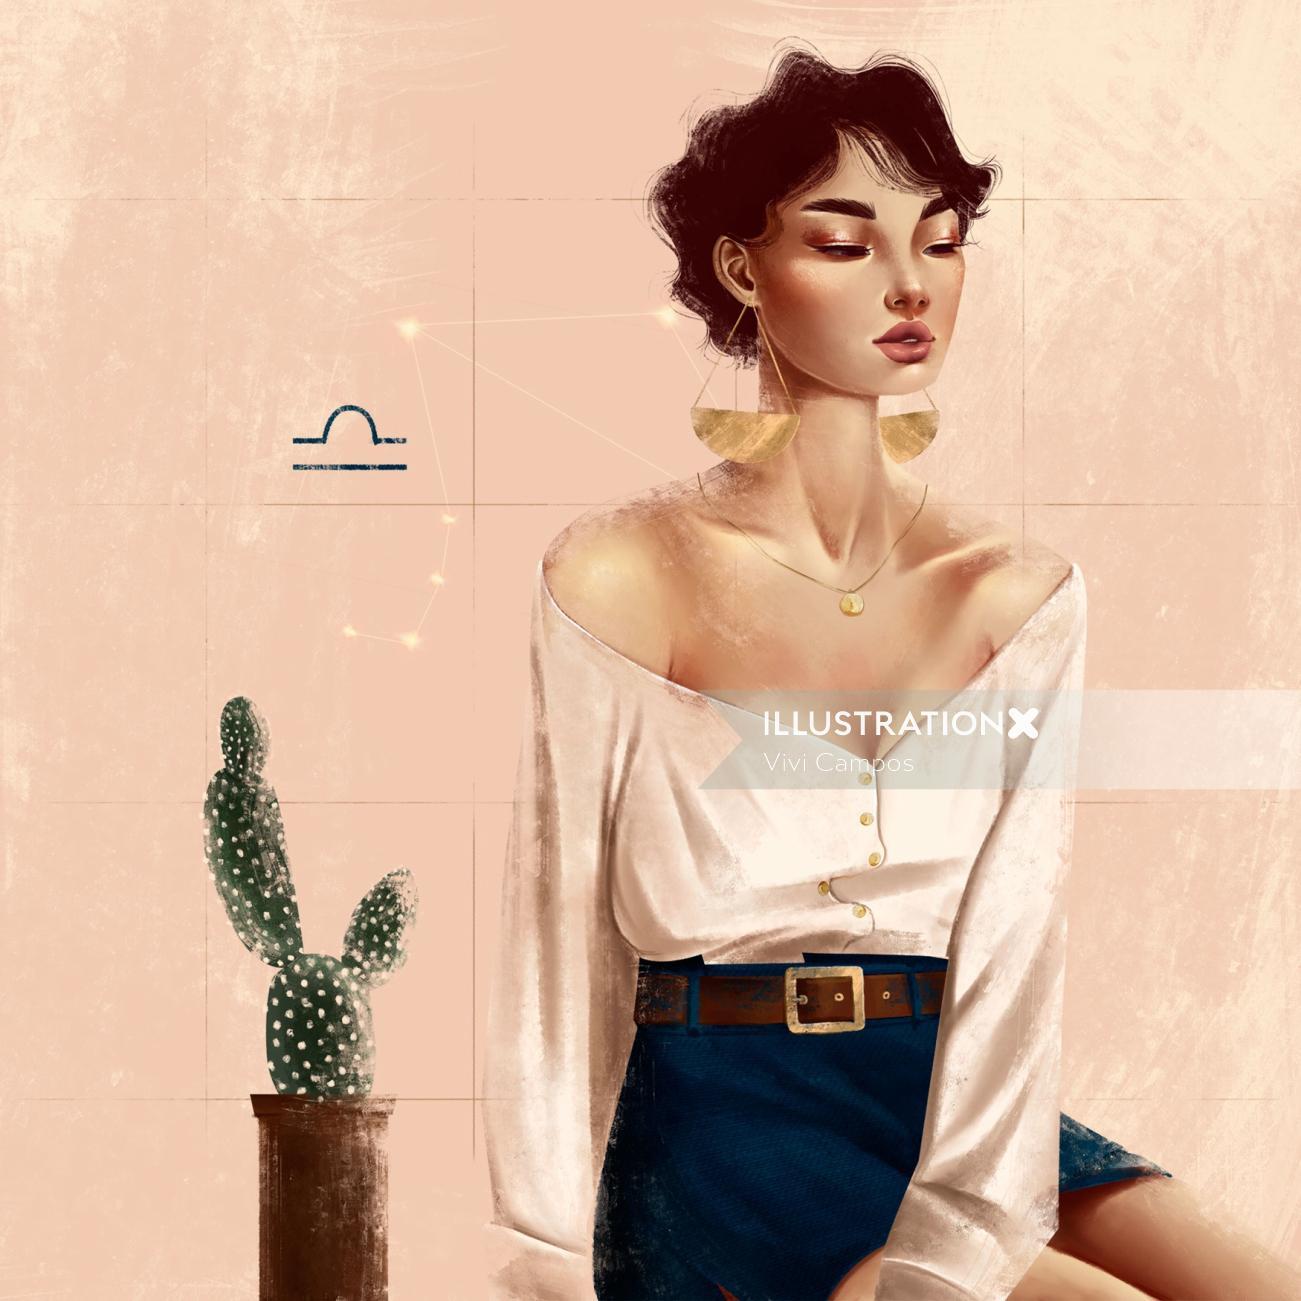 woman fashion illustration